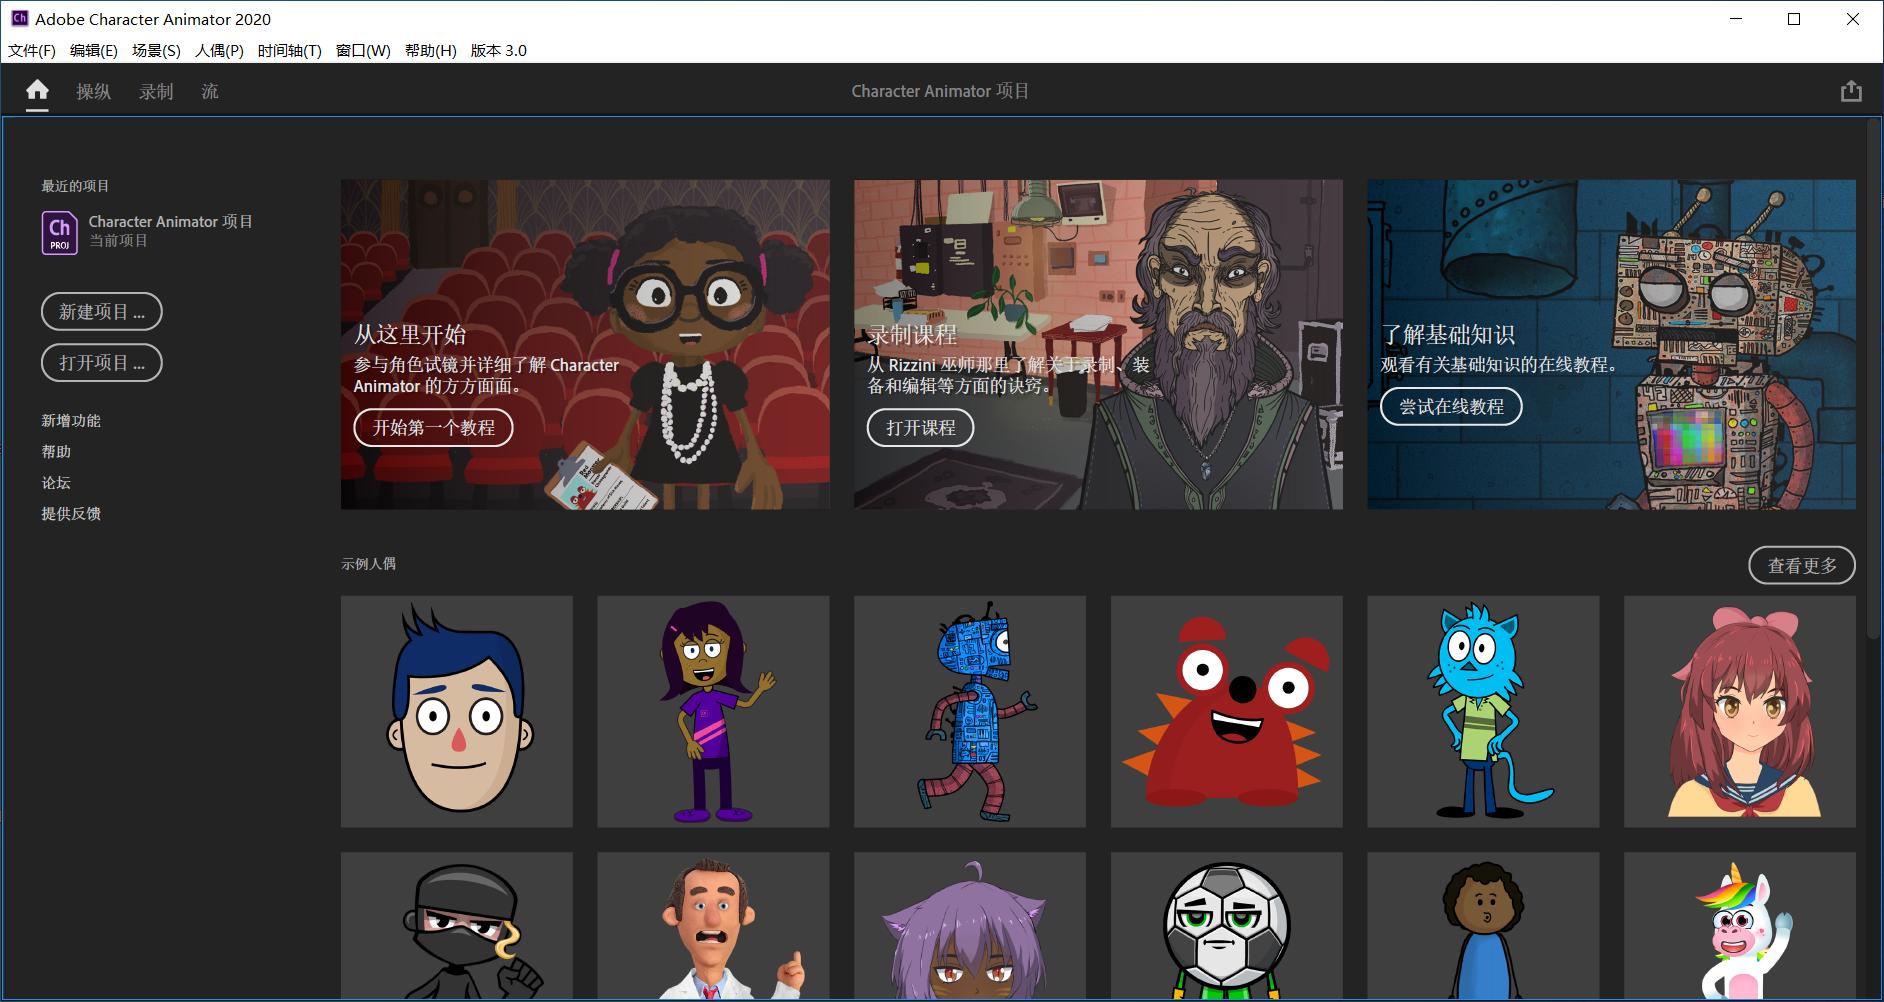 Adobe Character Animator 2020.png